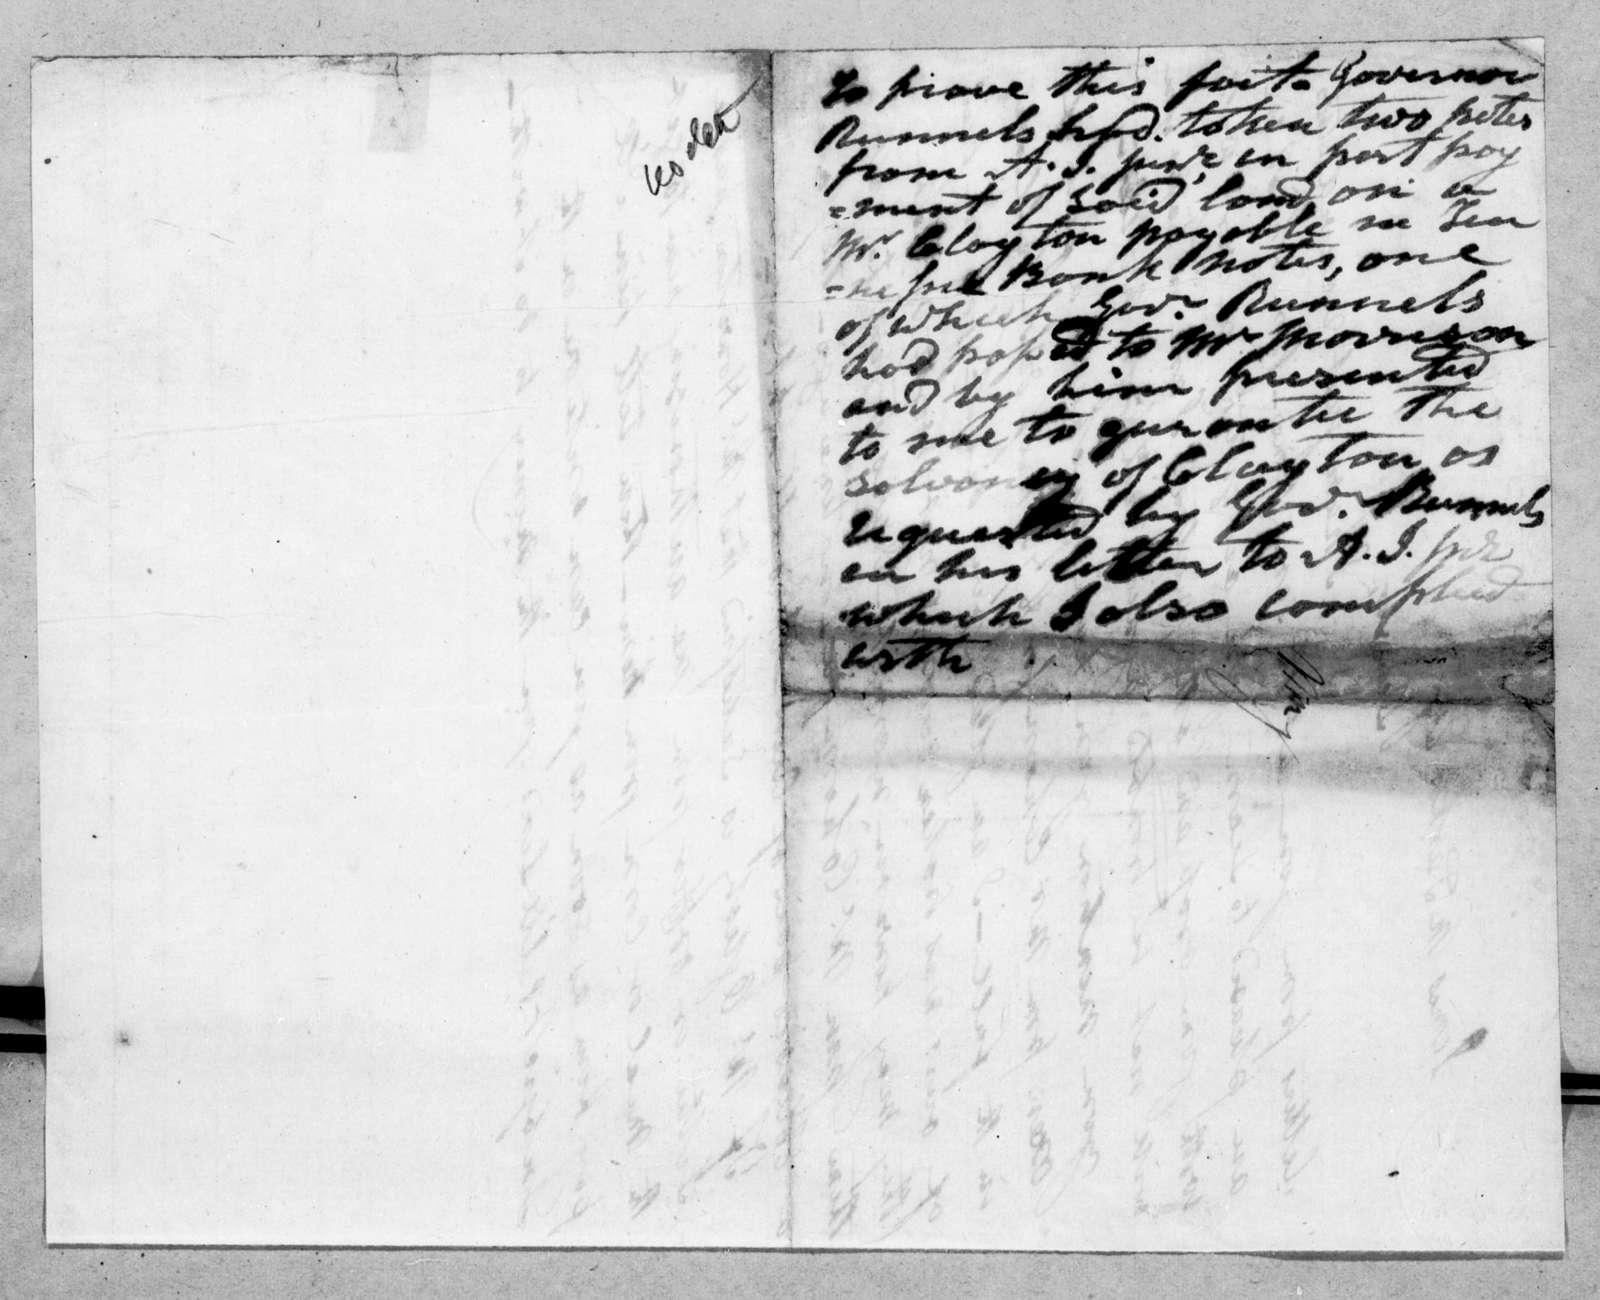 Andrew Jackson to James M. Jackson